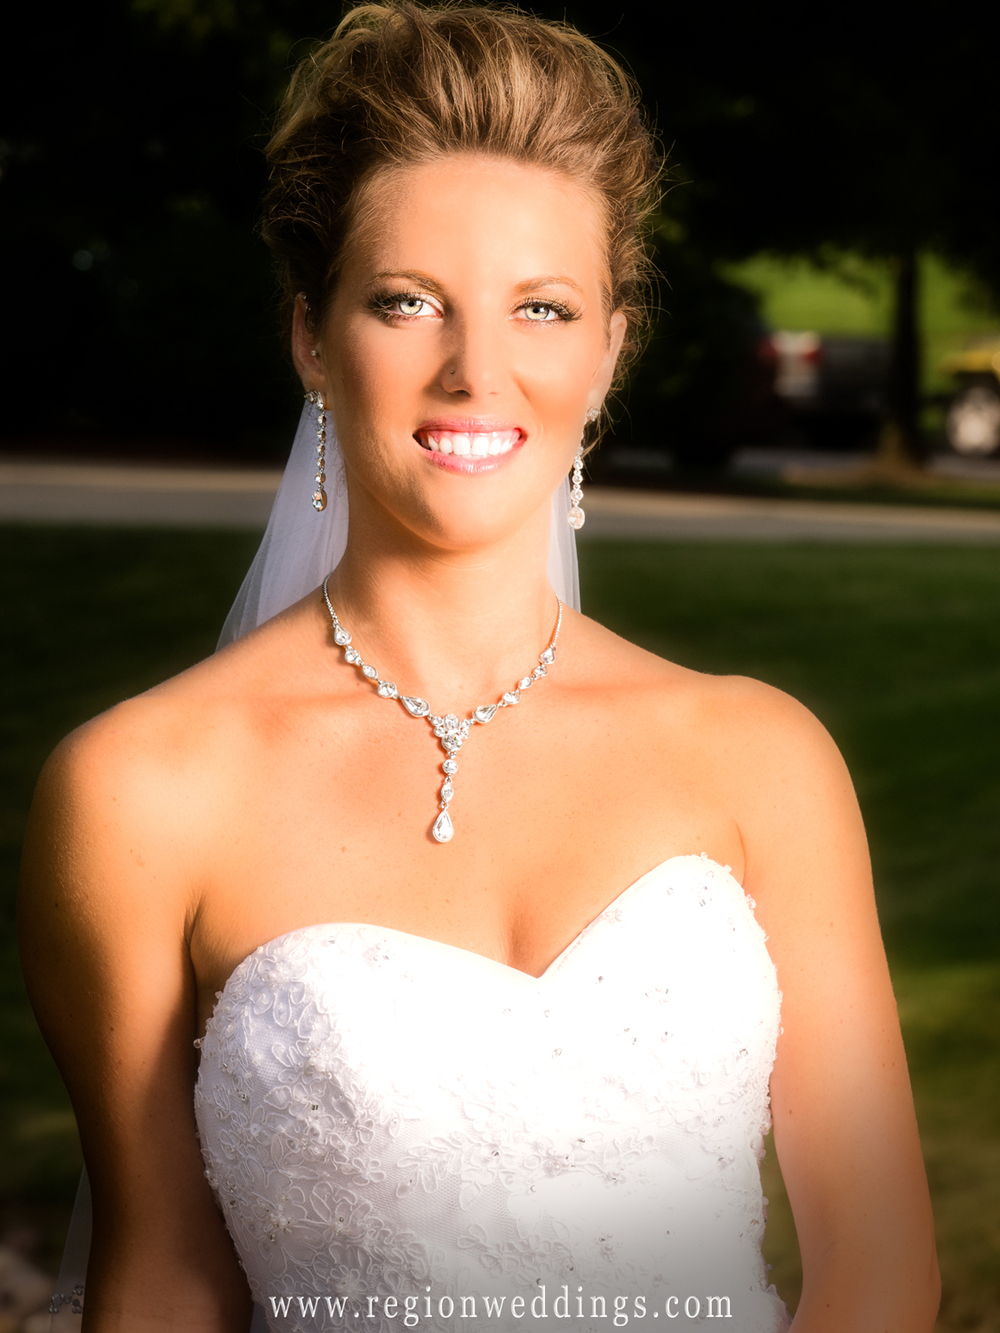 A pretty bride in a portrait taken at Ellendale Farm near downtown Crown Point.